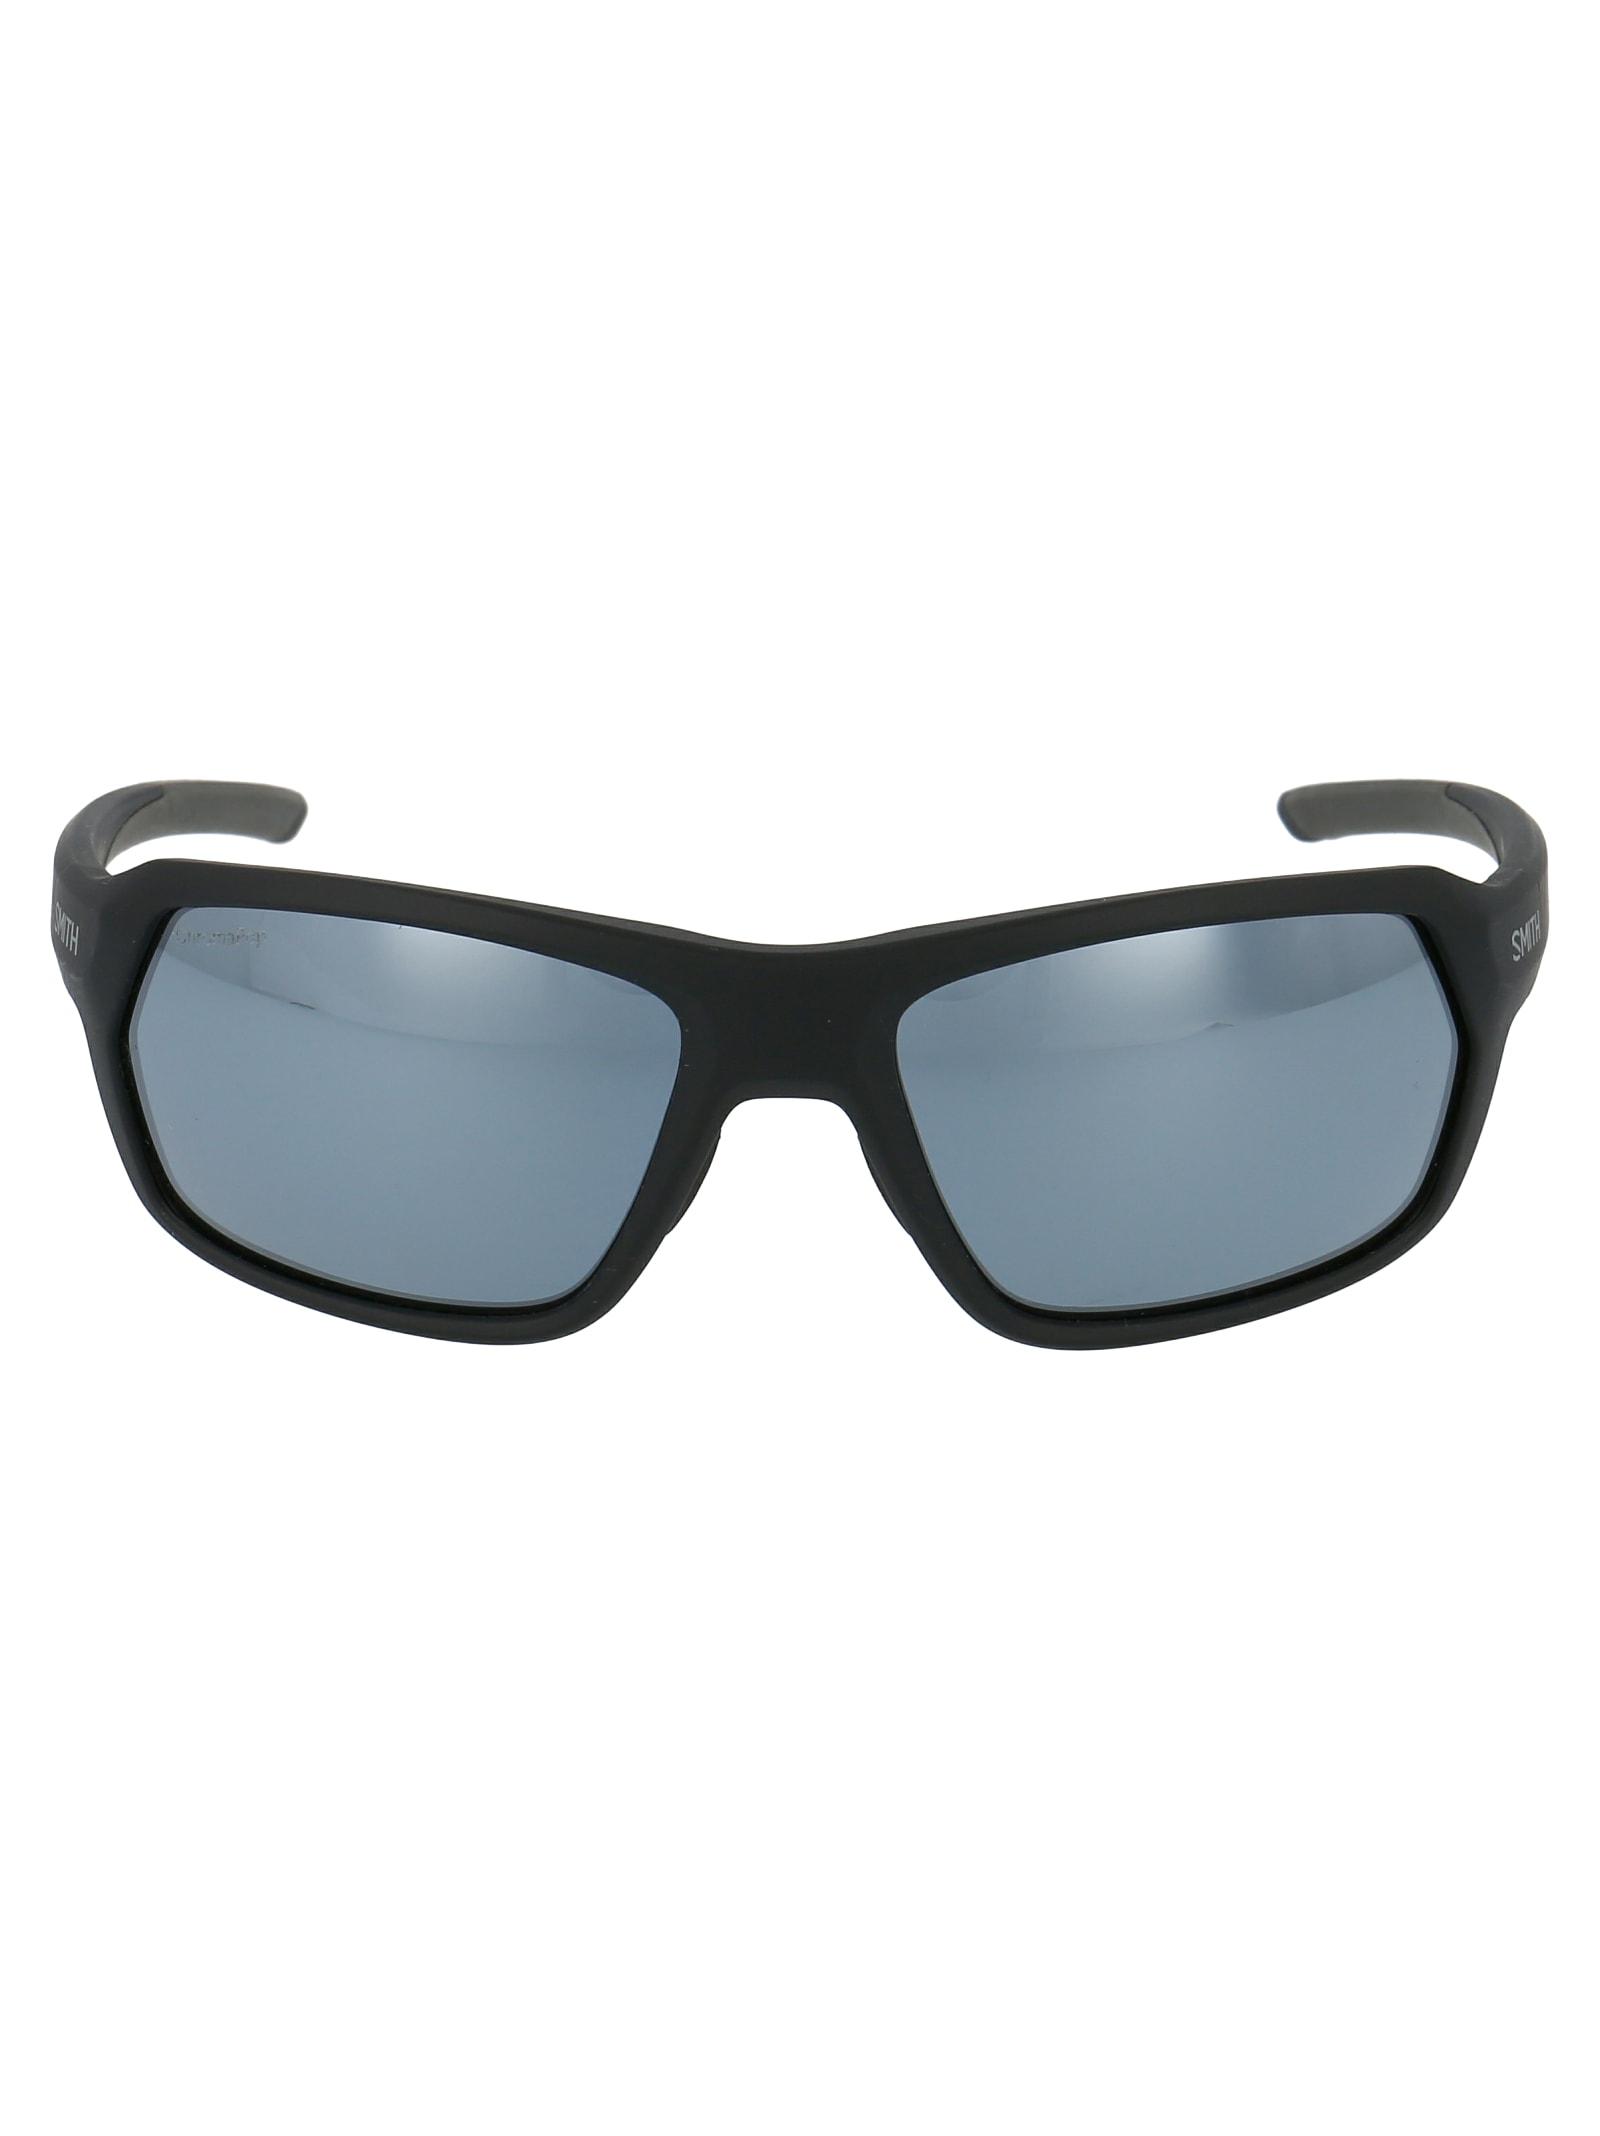 Smith Rebound Sunglasses In 003op Matt Black